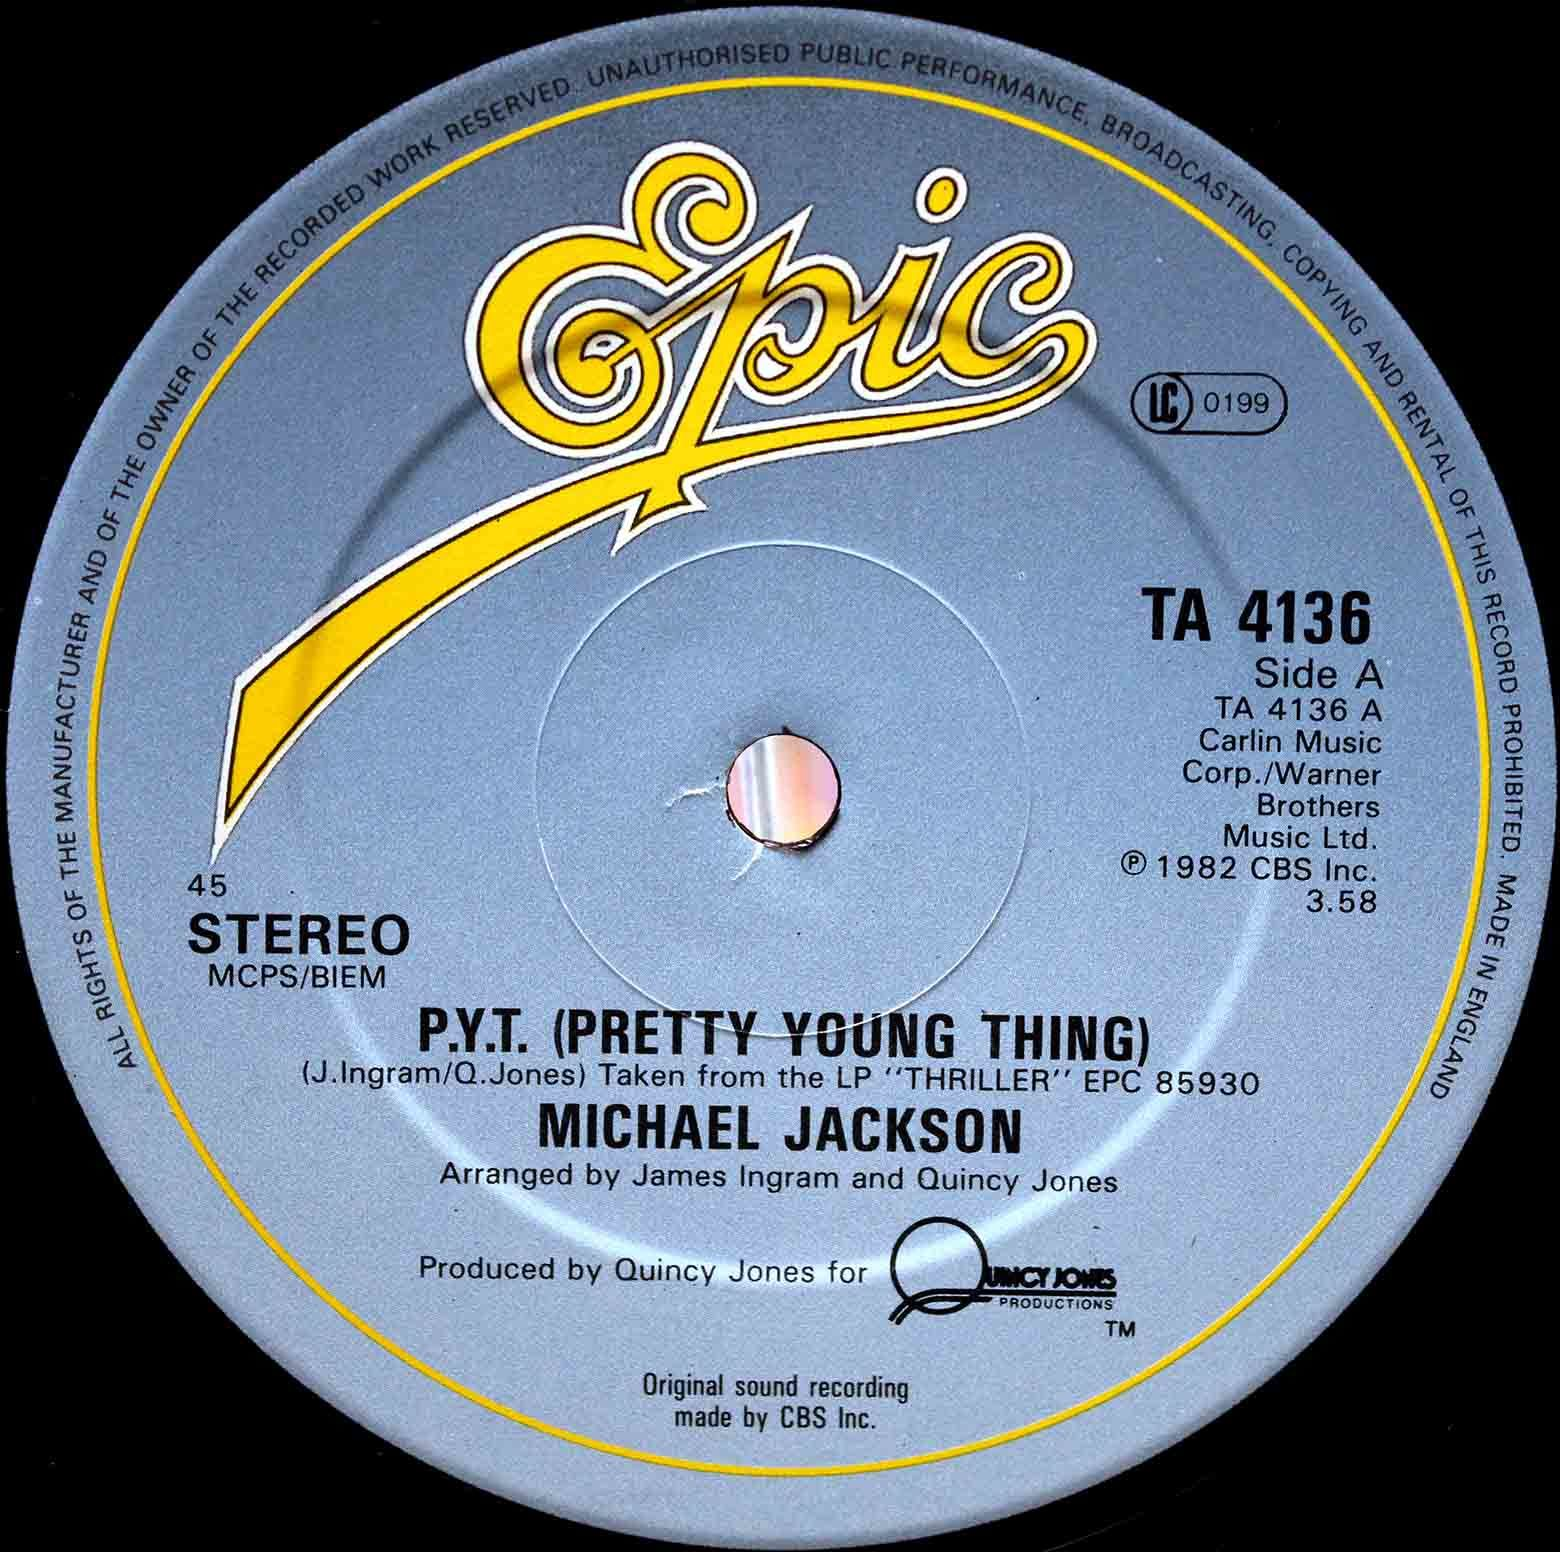 Michael Jackson – PYT 03